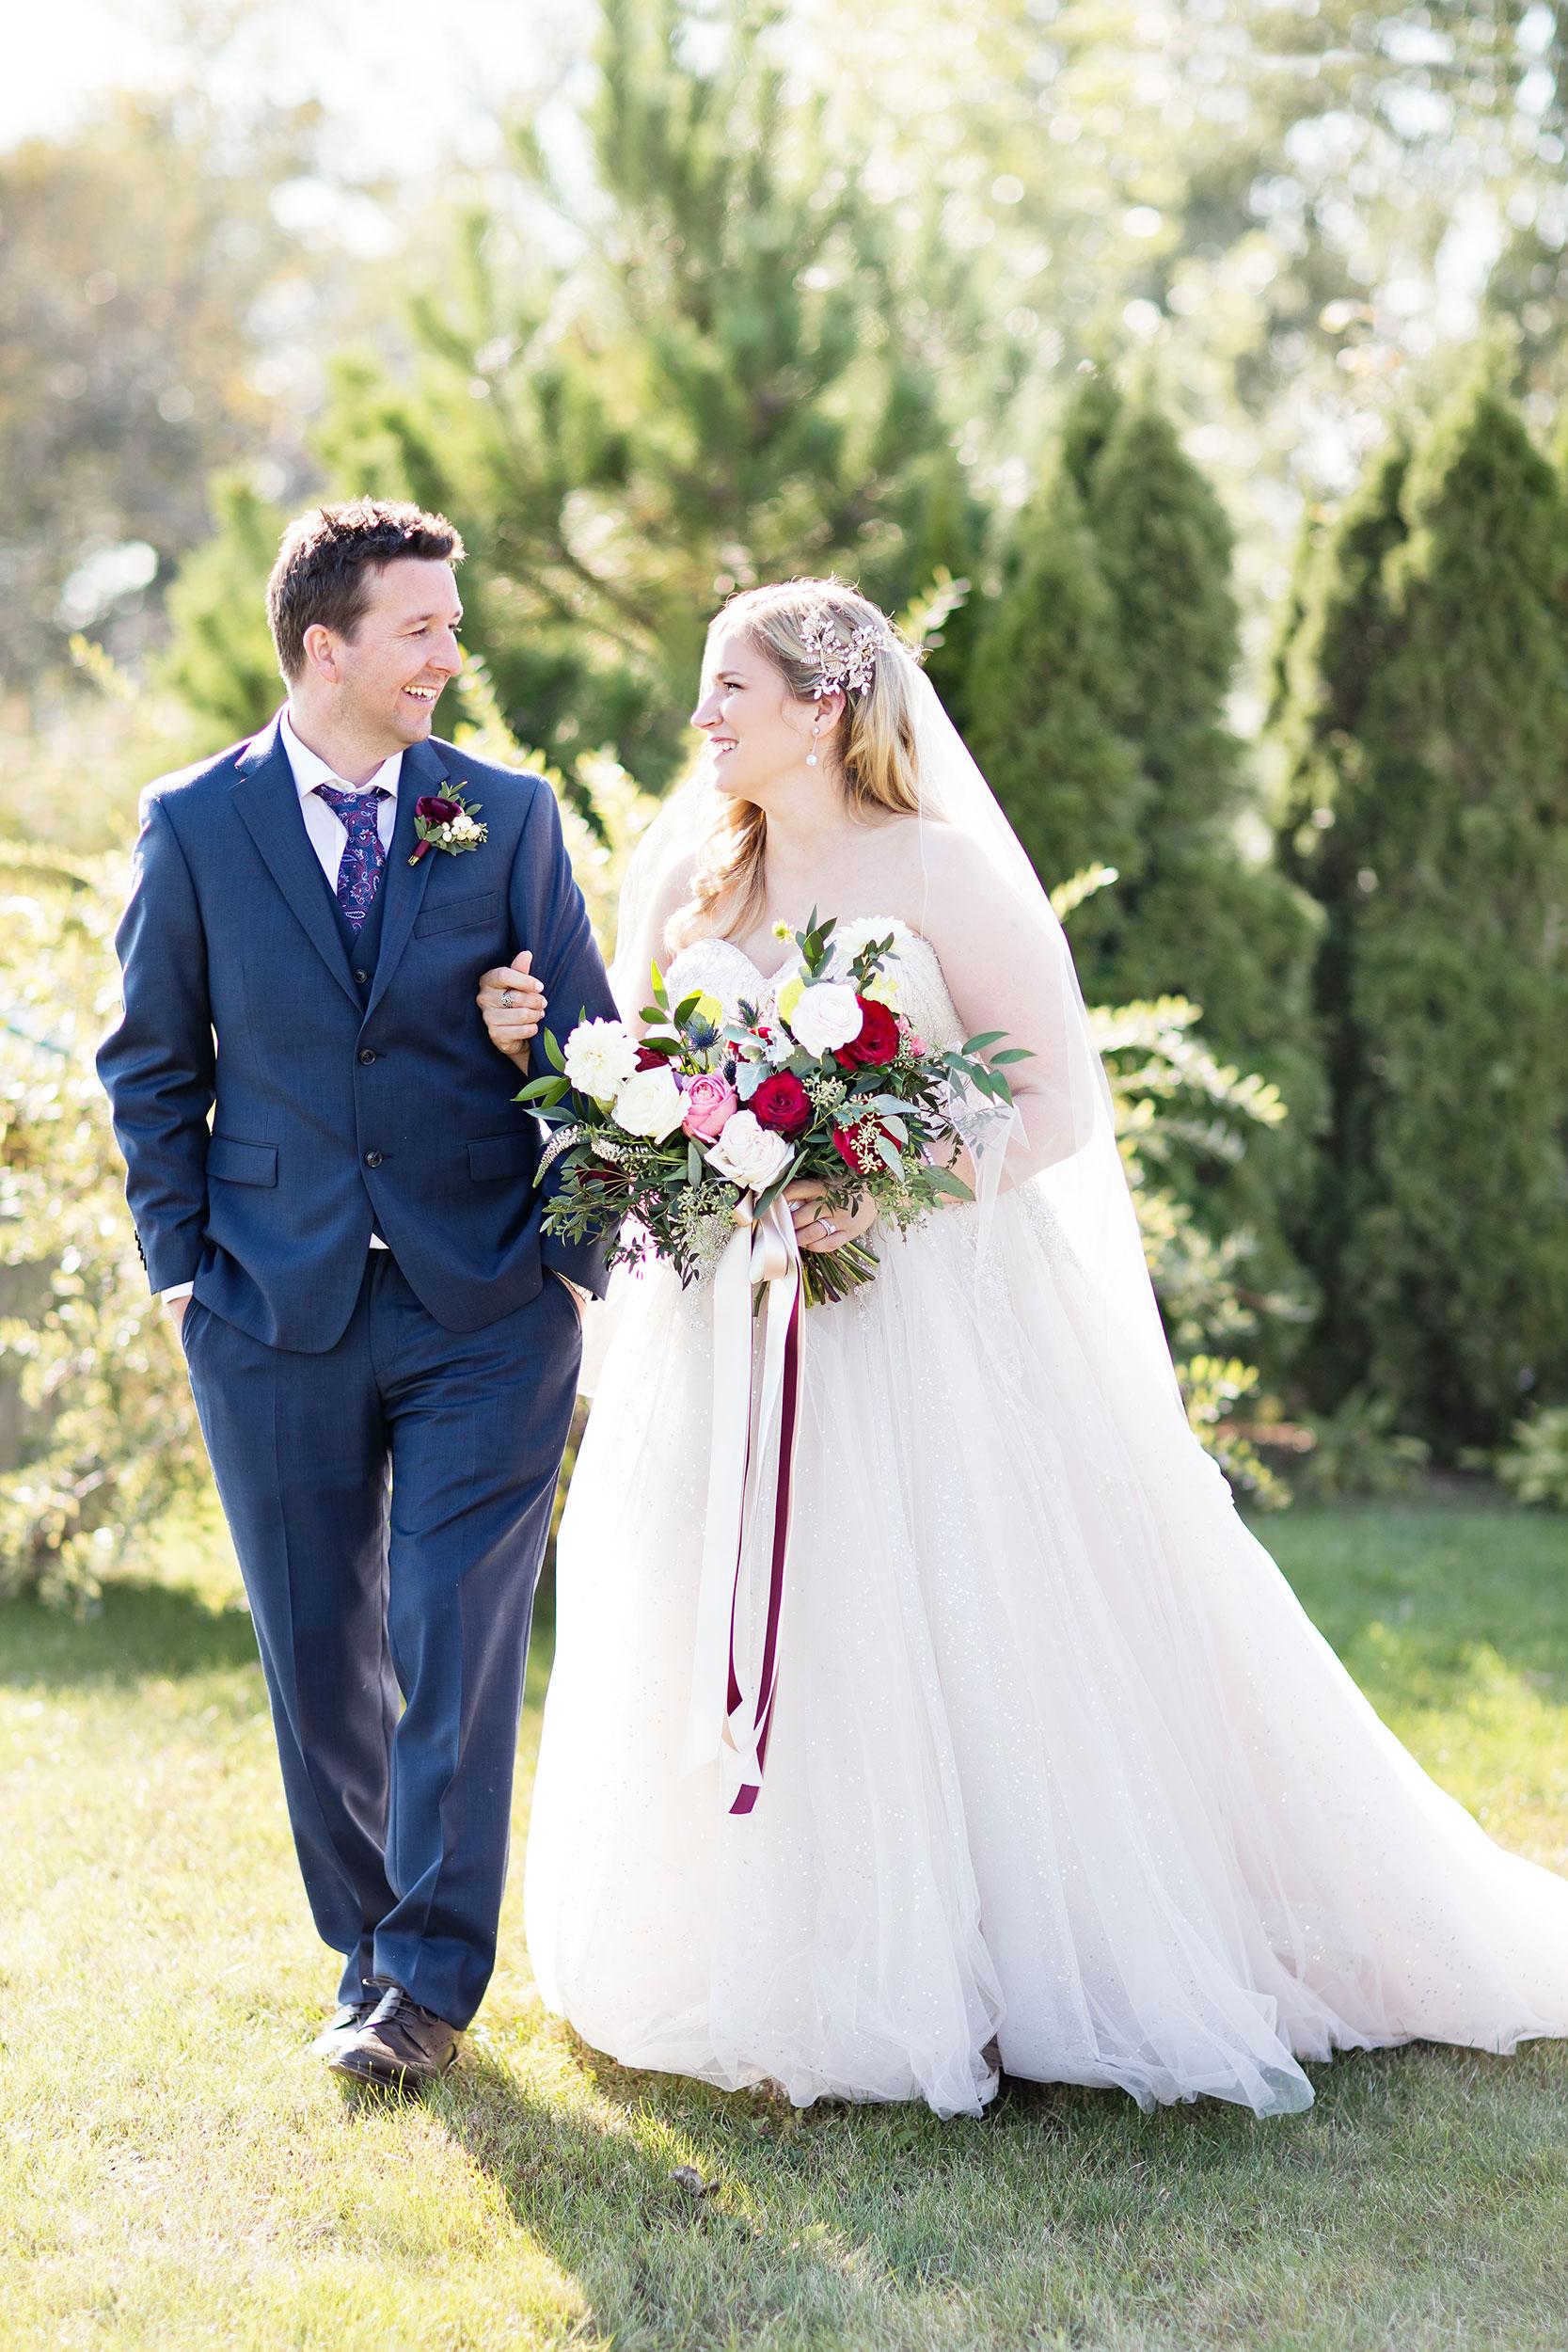 windsor-ontario-wedding-photographer-botanical-wedding-toronto-weddingbells-magazine-eryn-shea-photography-02.jpg